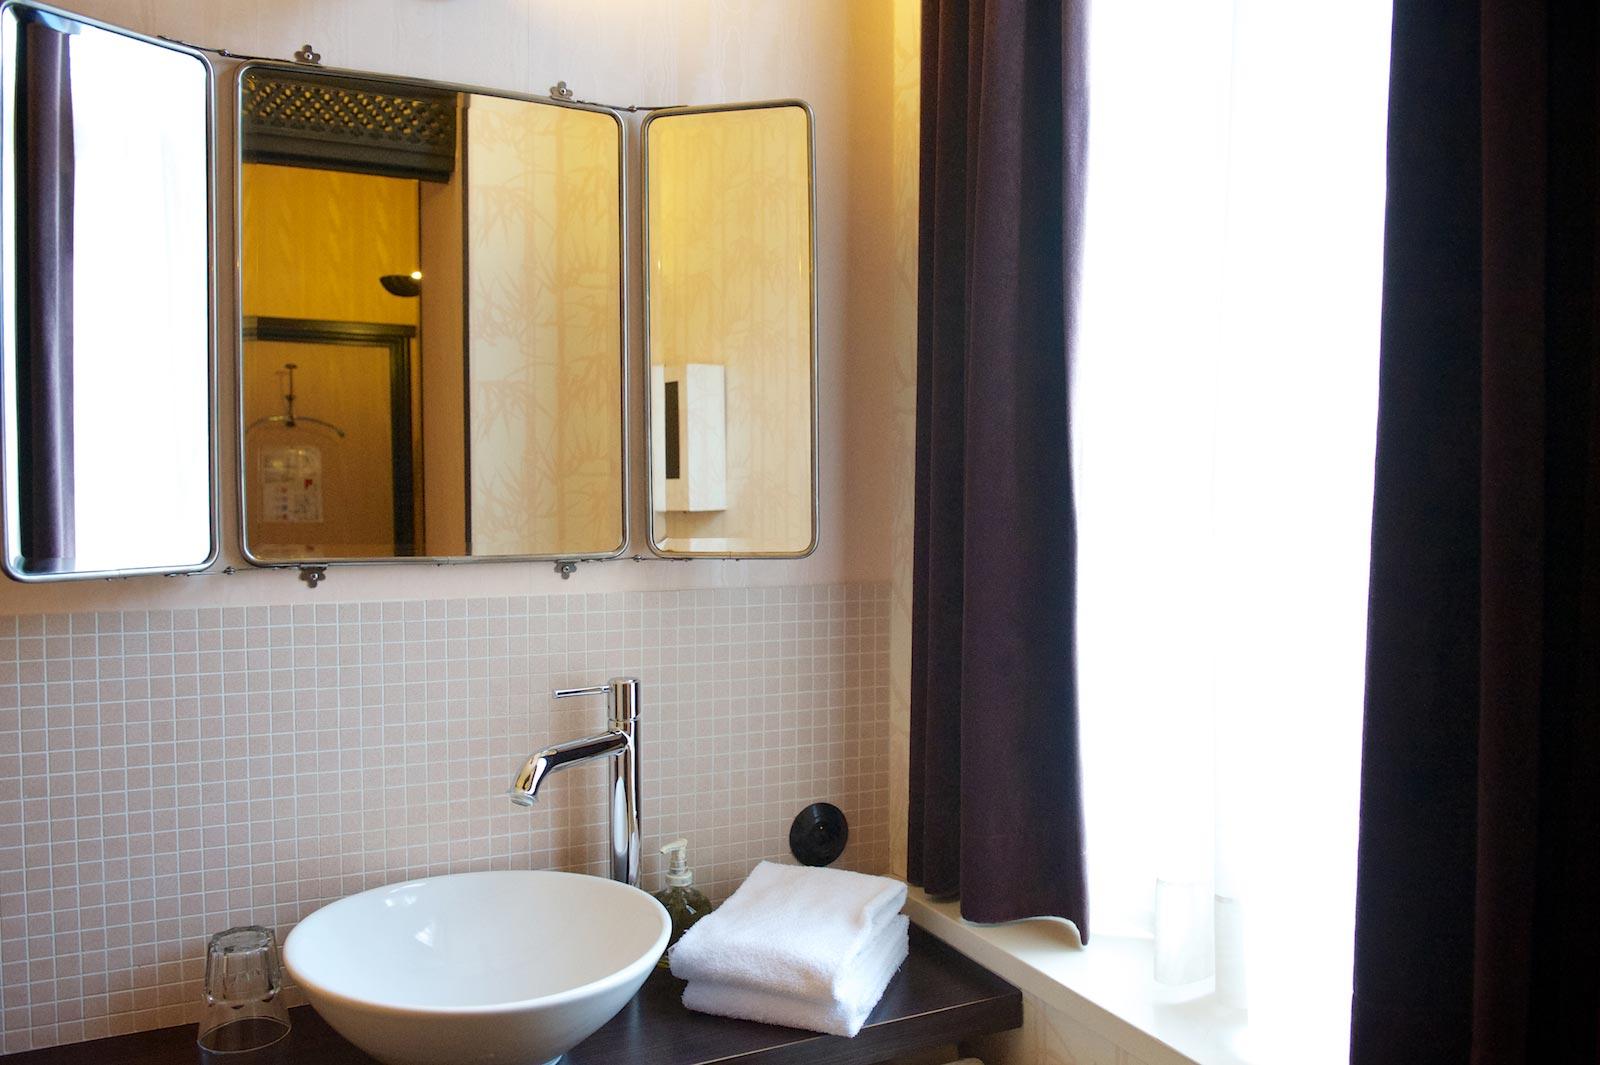 hotel-le-berger-rooms-superieur-jeanne-10-02.jpg